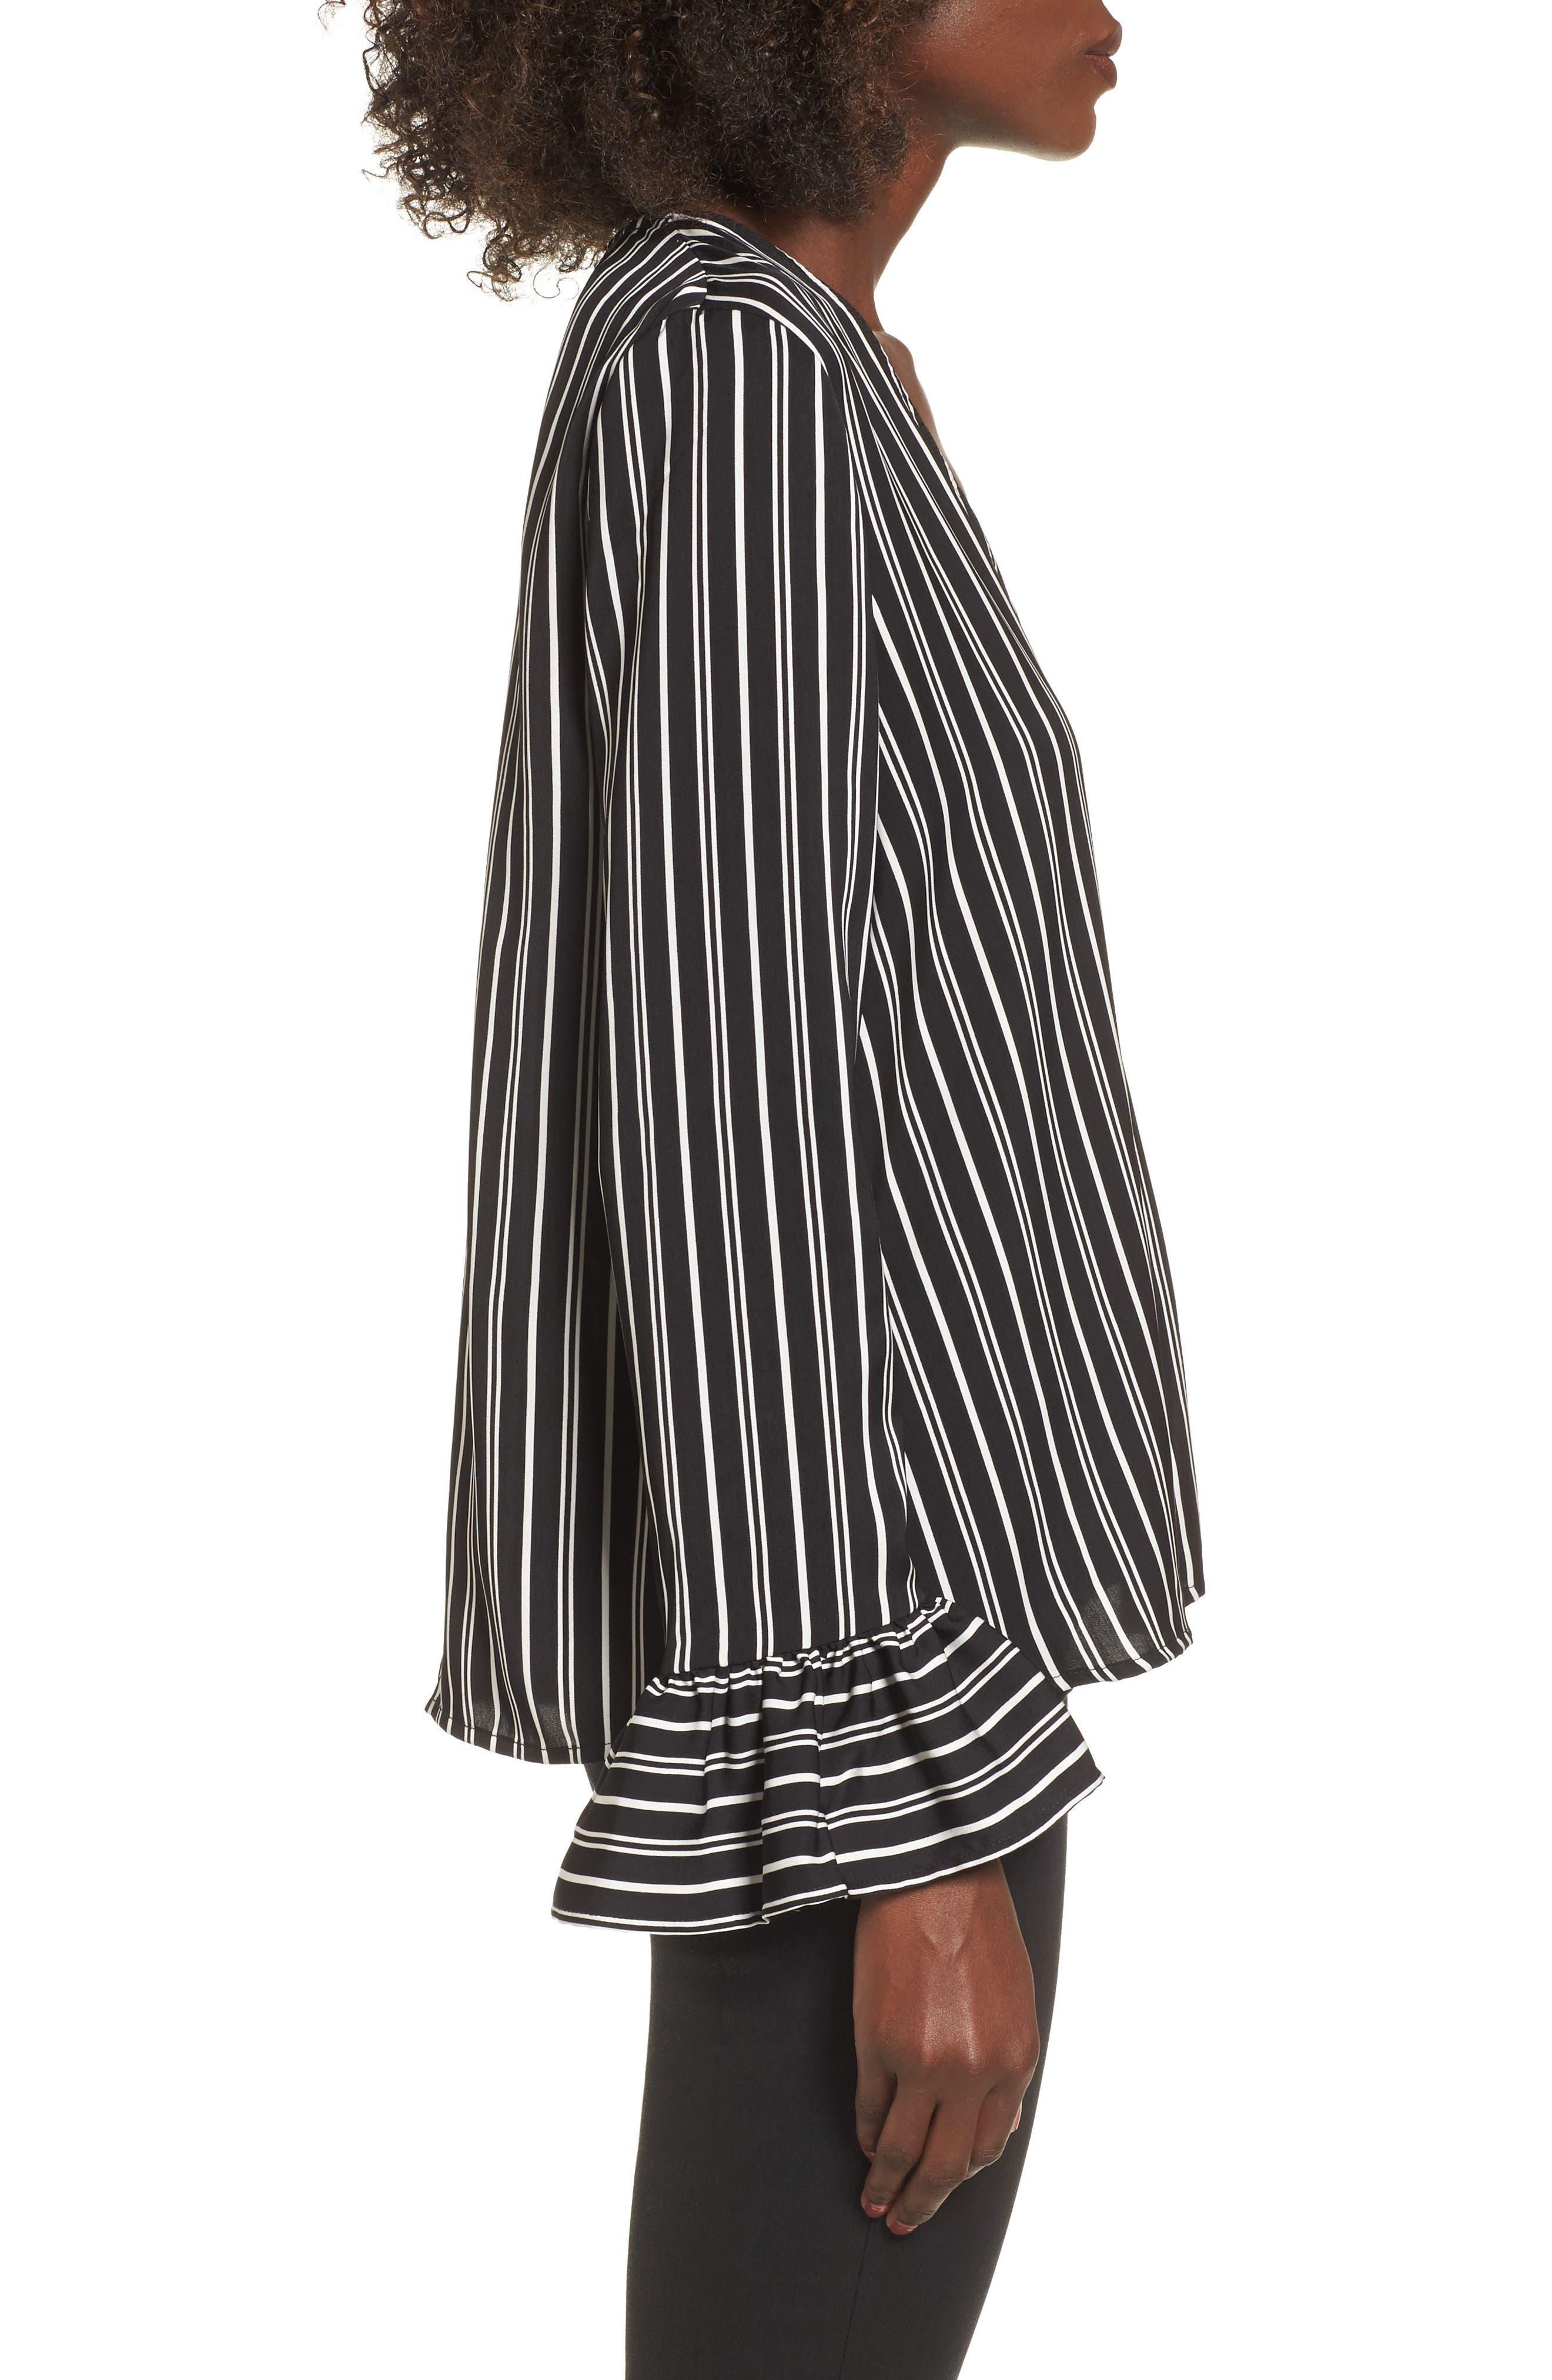 Ophelia Stripe Flare Cuff Top,                             Alternate thumbnail 3, color,